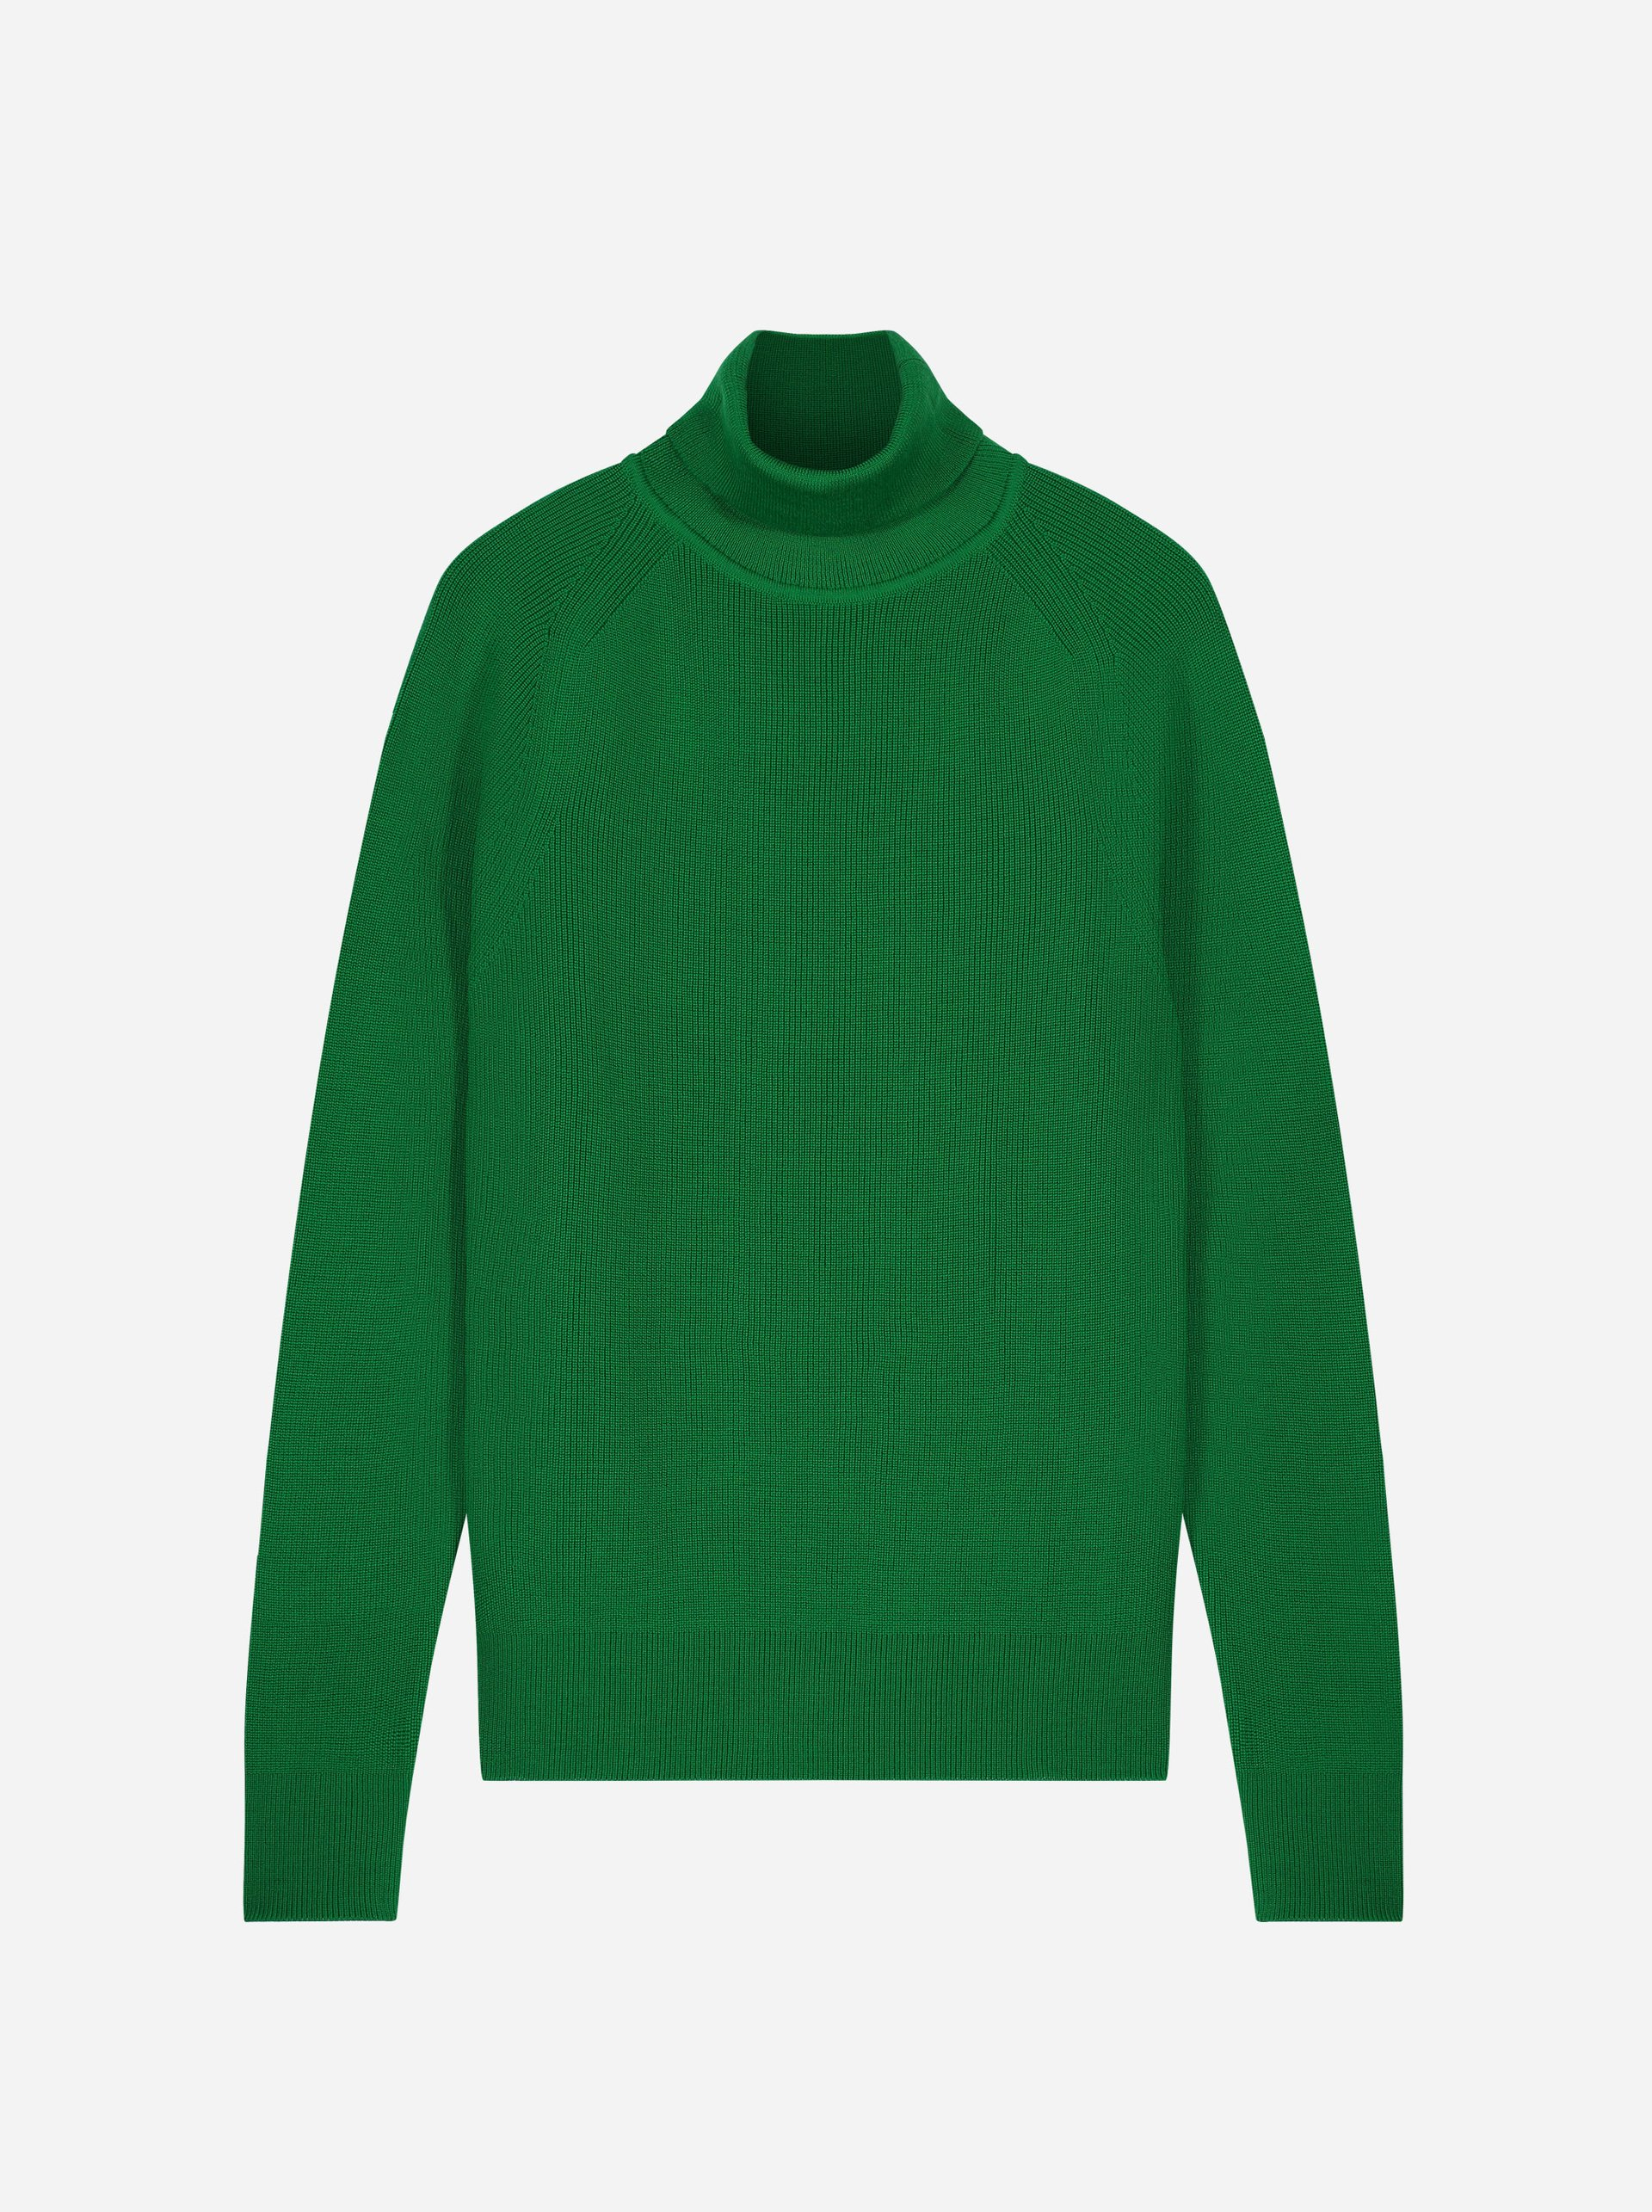 Teym - Turtleneck - The Merino Sweater - Men - Bright Green - 4